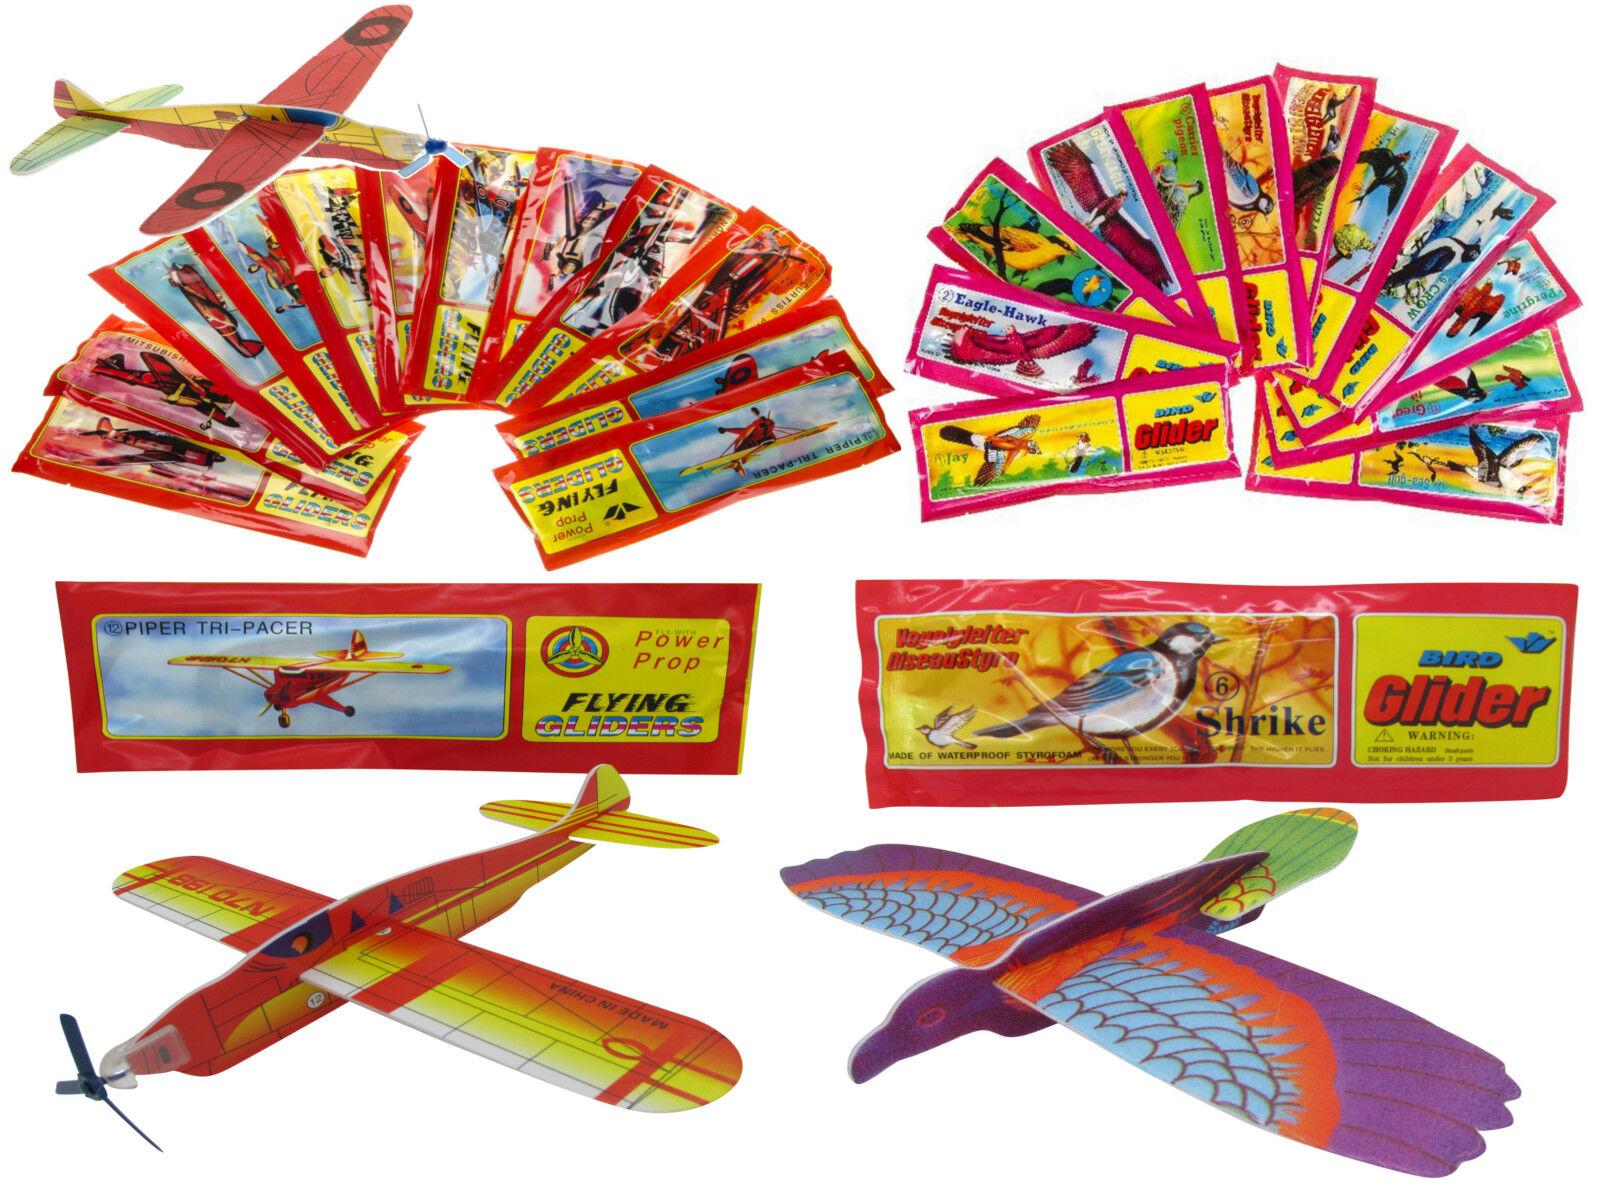 Styroporflugzeug Styroporflieger Styropor Flugzeug Vogel Spielzeug Mitgebsel Sonstige